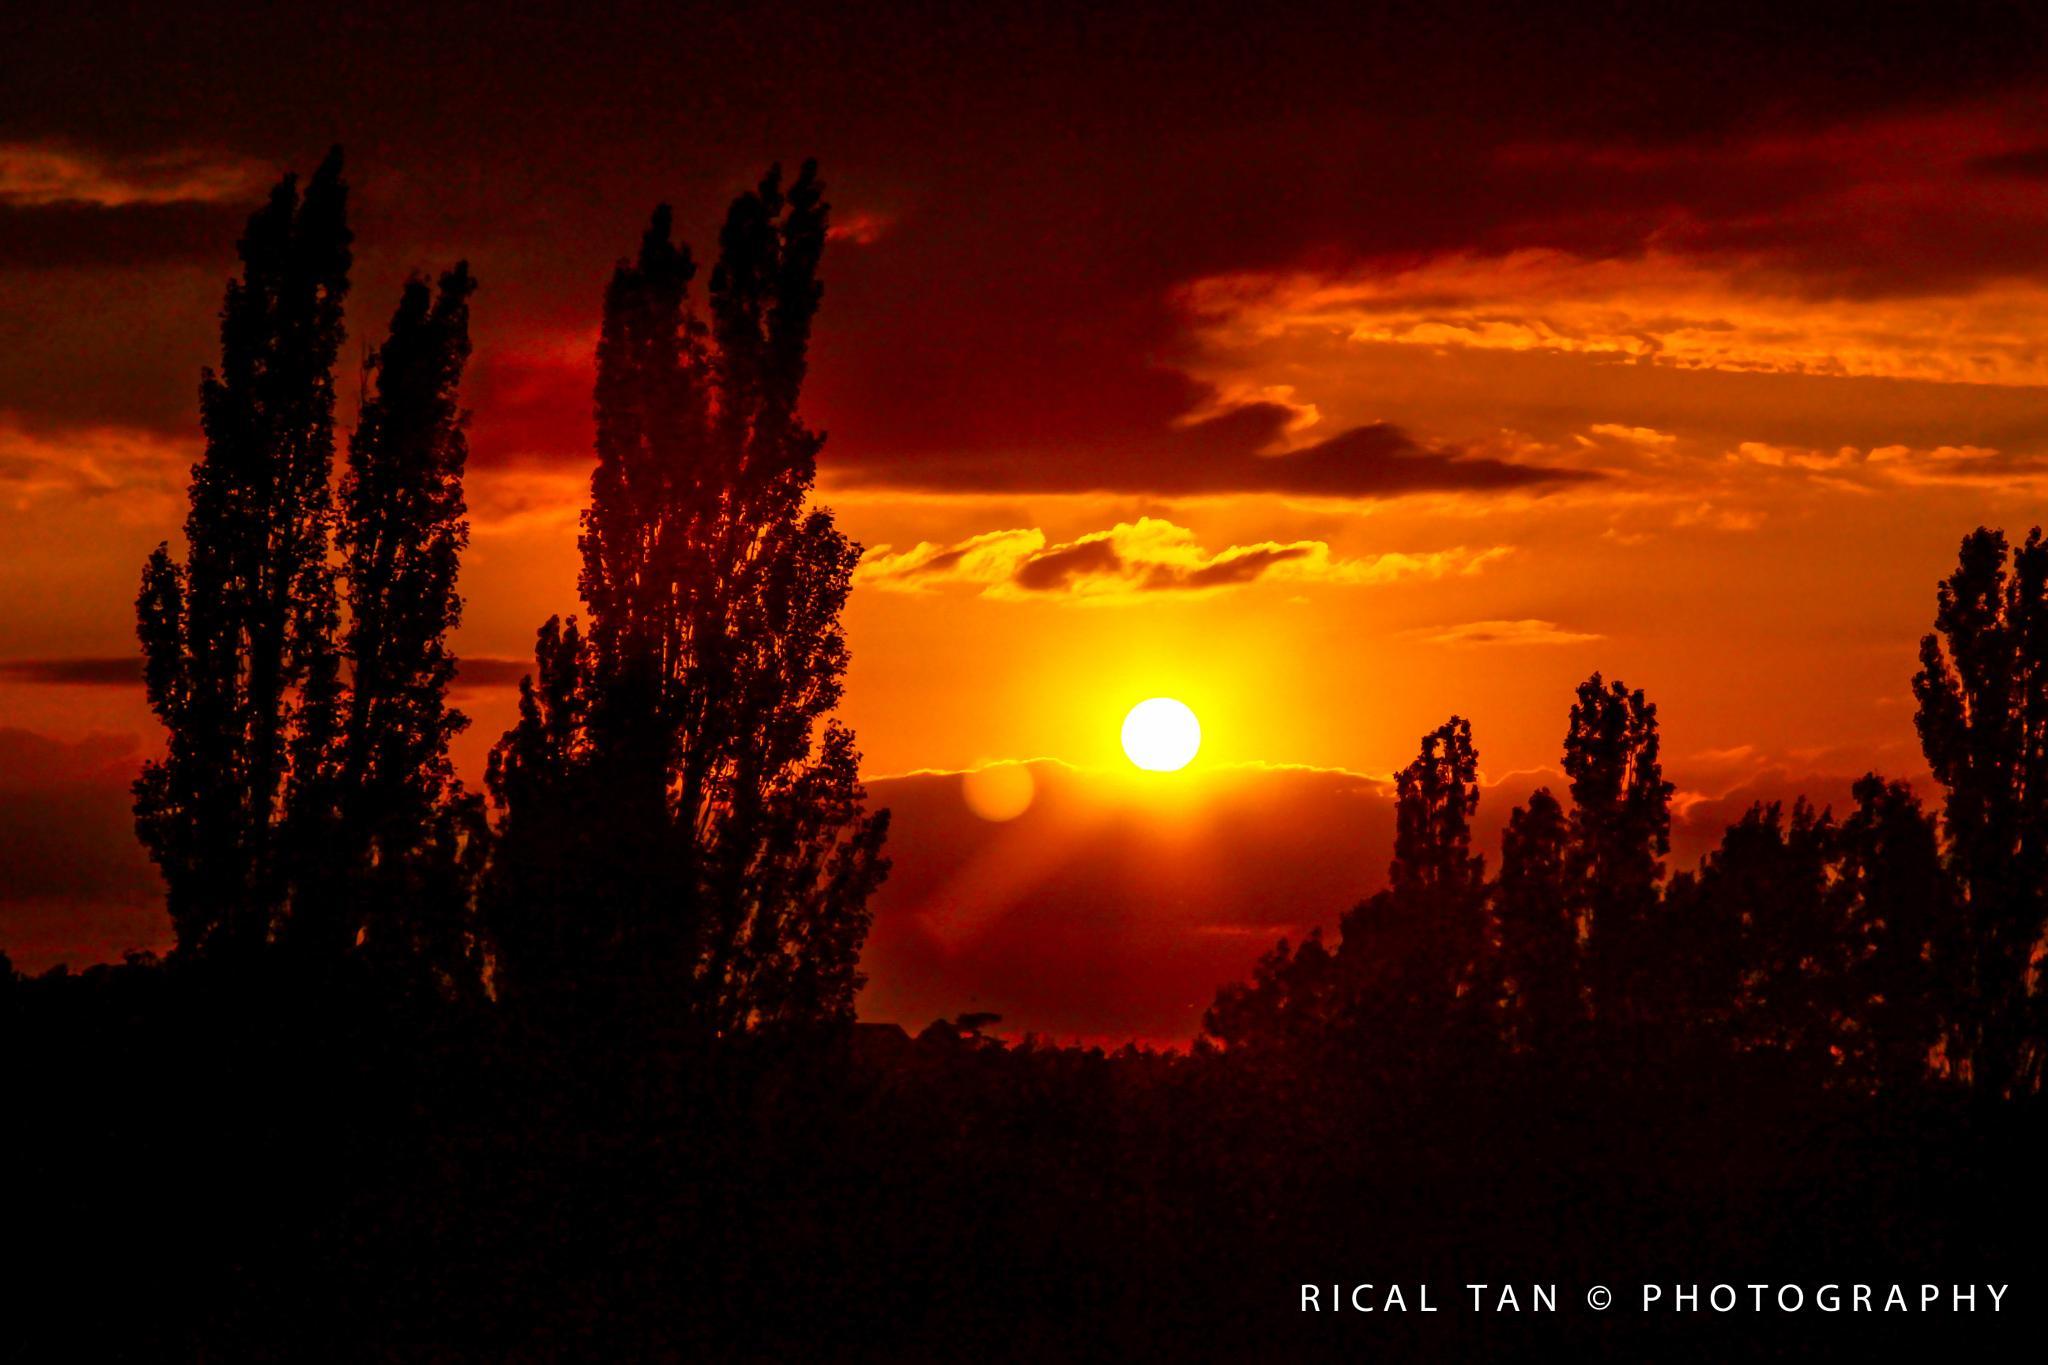 S U N S E T I N B A S I L D O N/ ESSEX by Rical Tan